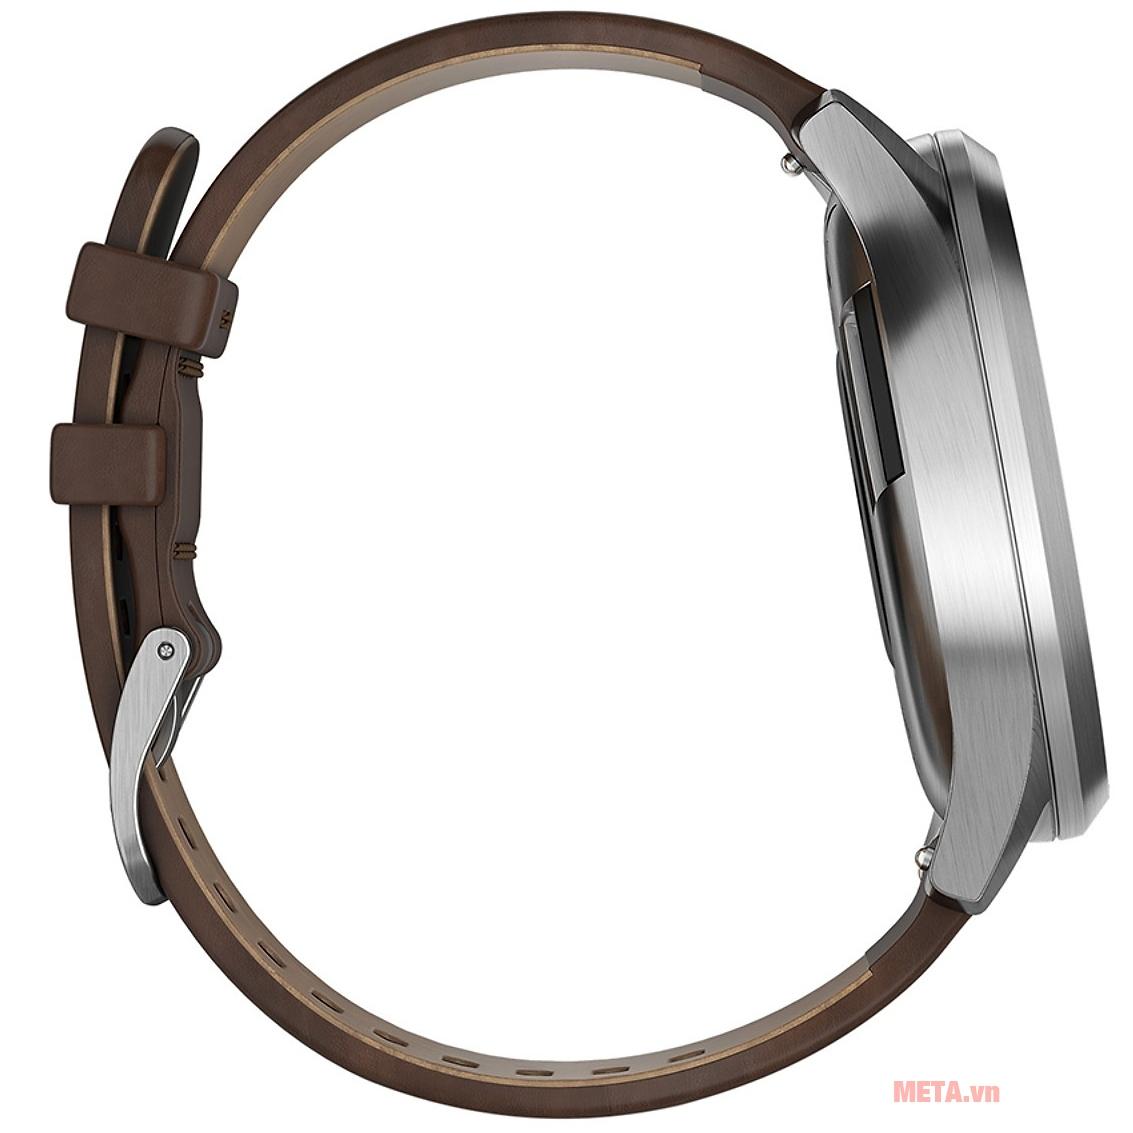 Đồng hồ Garmin vivomove HR (Premium edition) có dây đeo cao cấp, thời trang